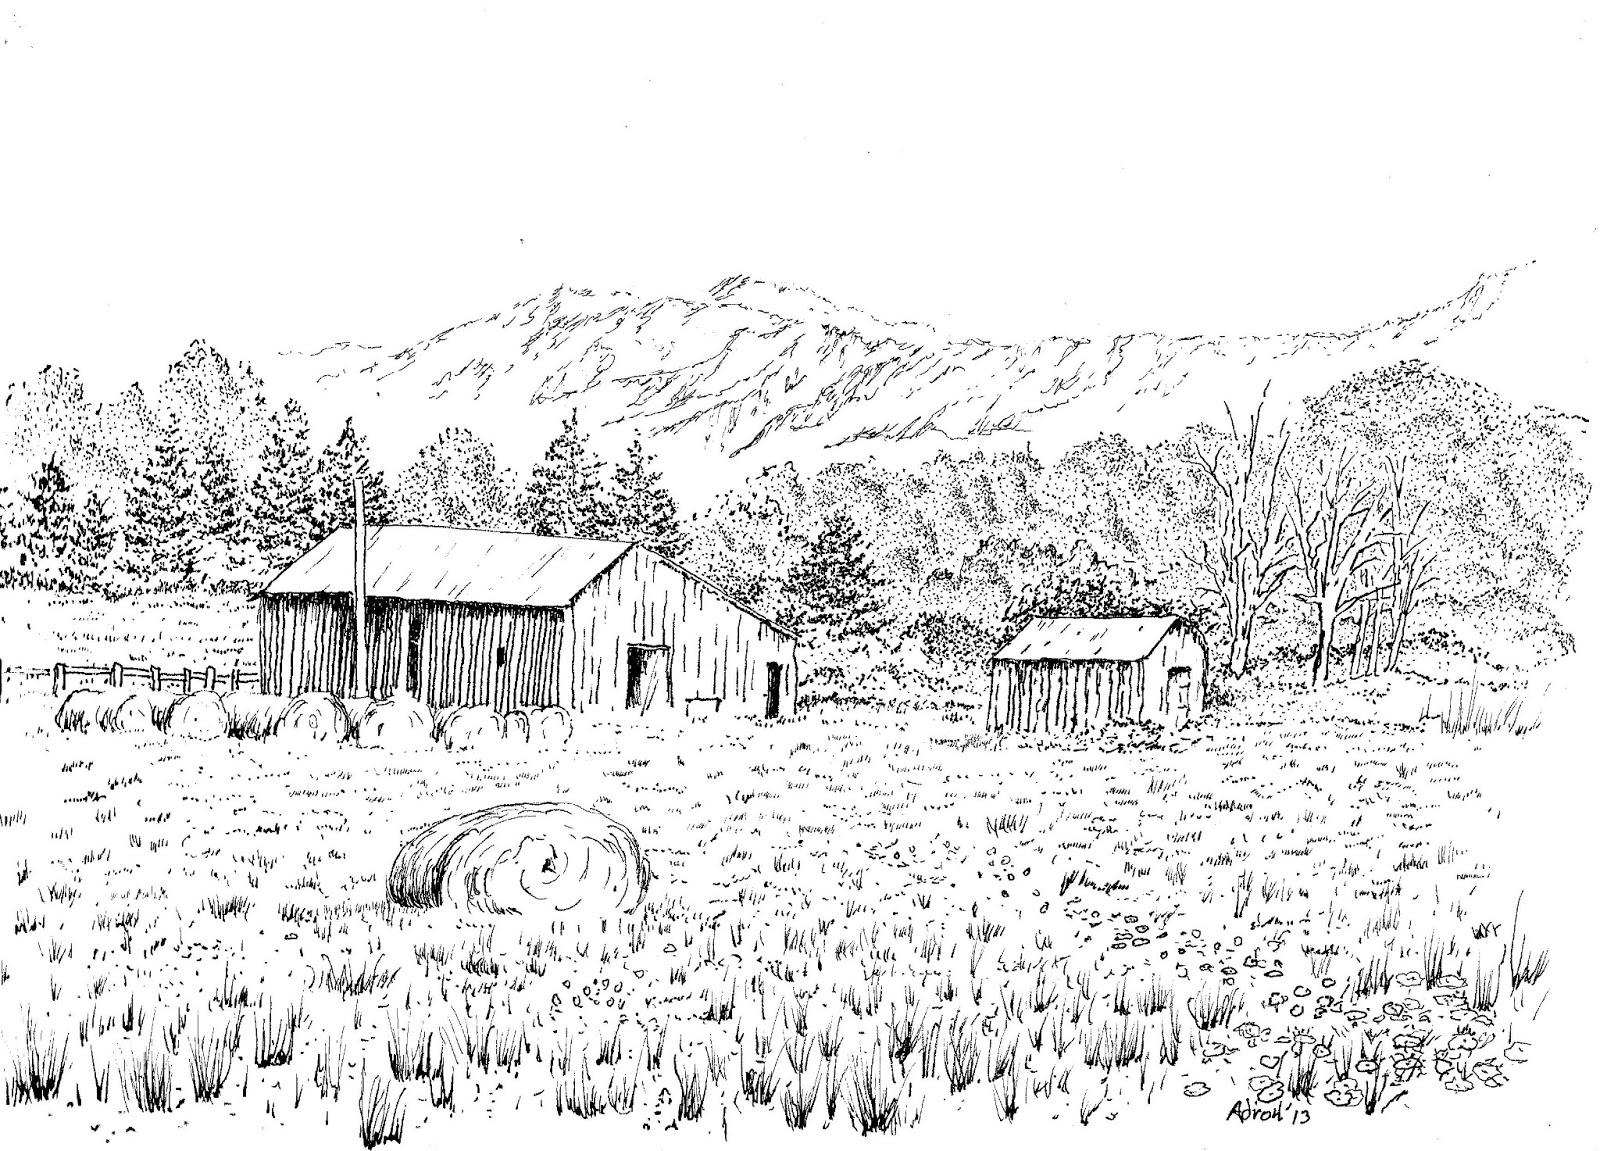 Artist Adron Rural Barn Scene In Fine Tipped Marker